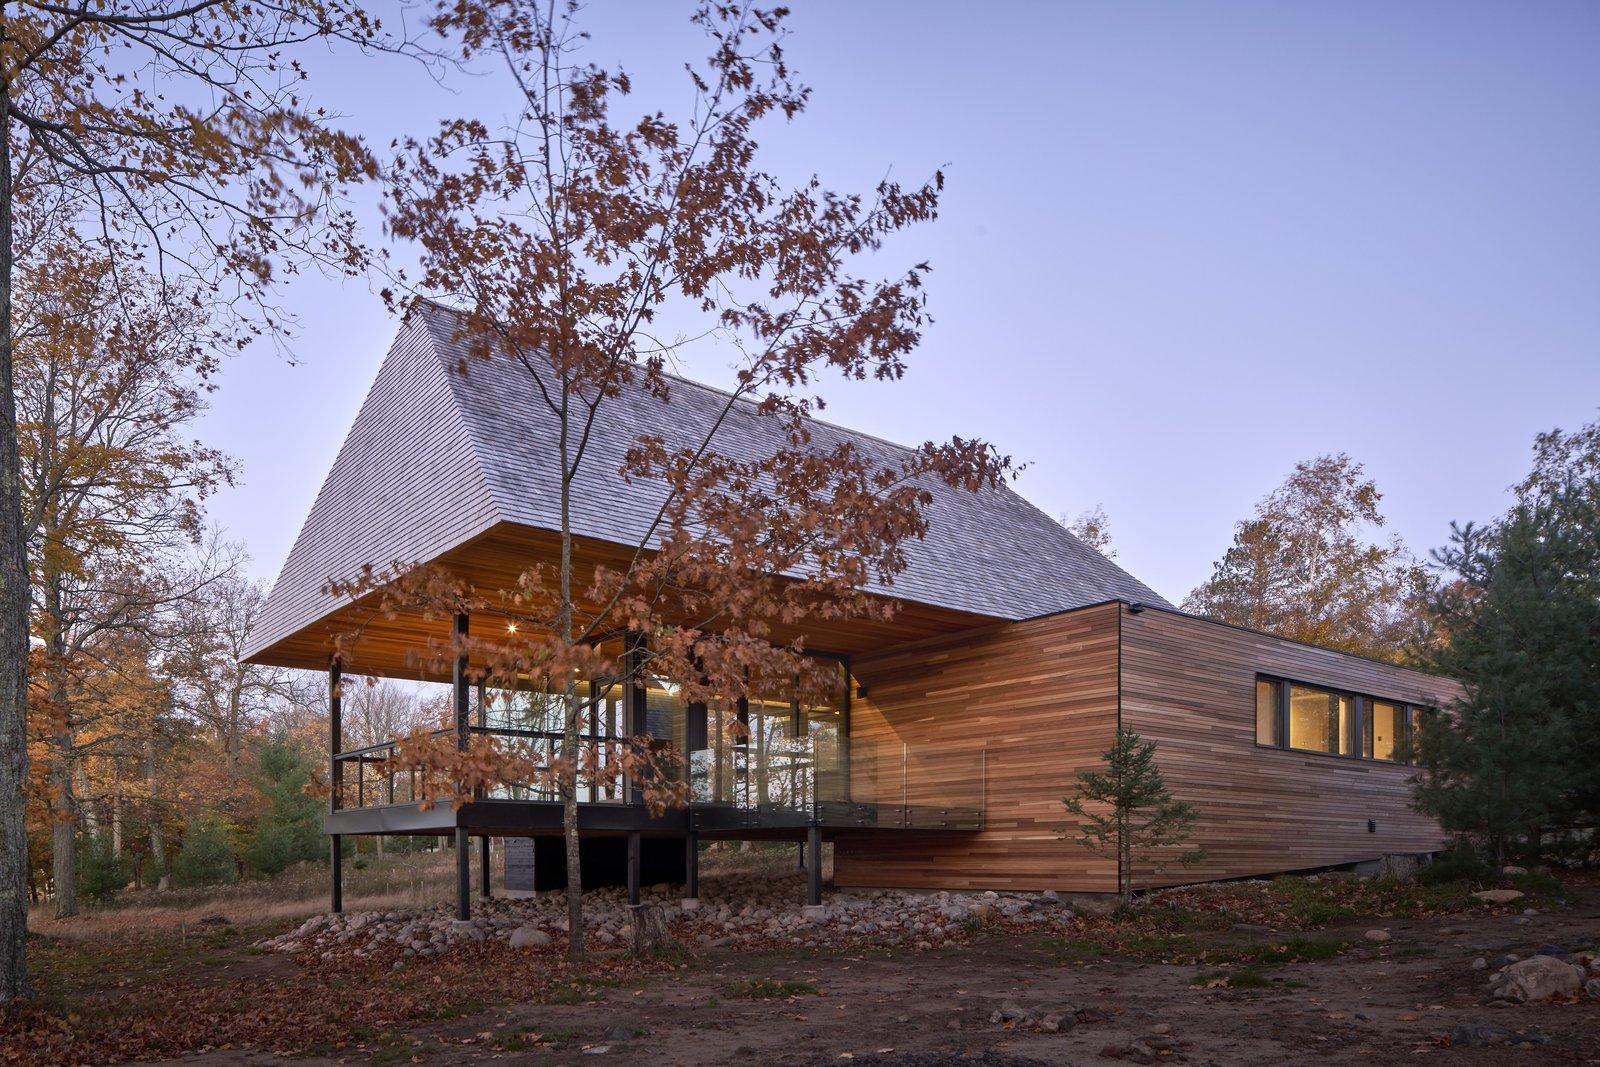 Bigwin Island Cabins MacKay-Lyons Sweetapple Architects exterior